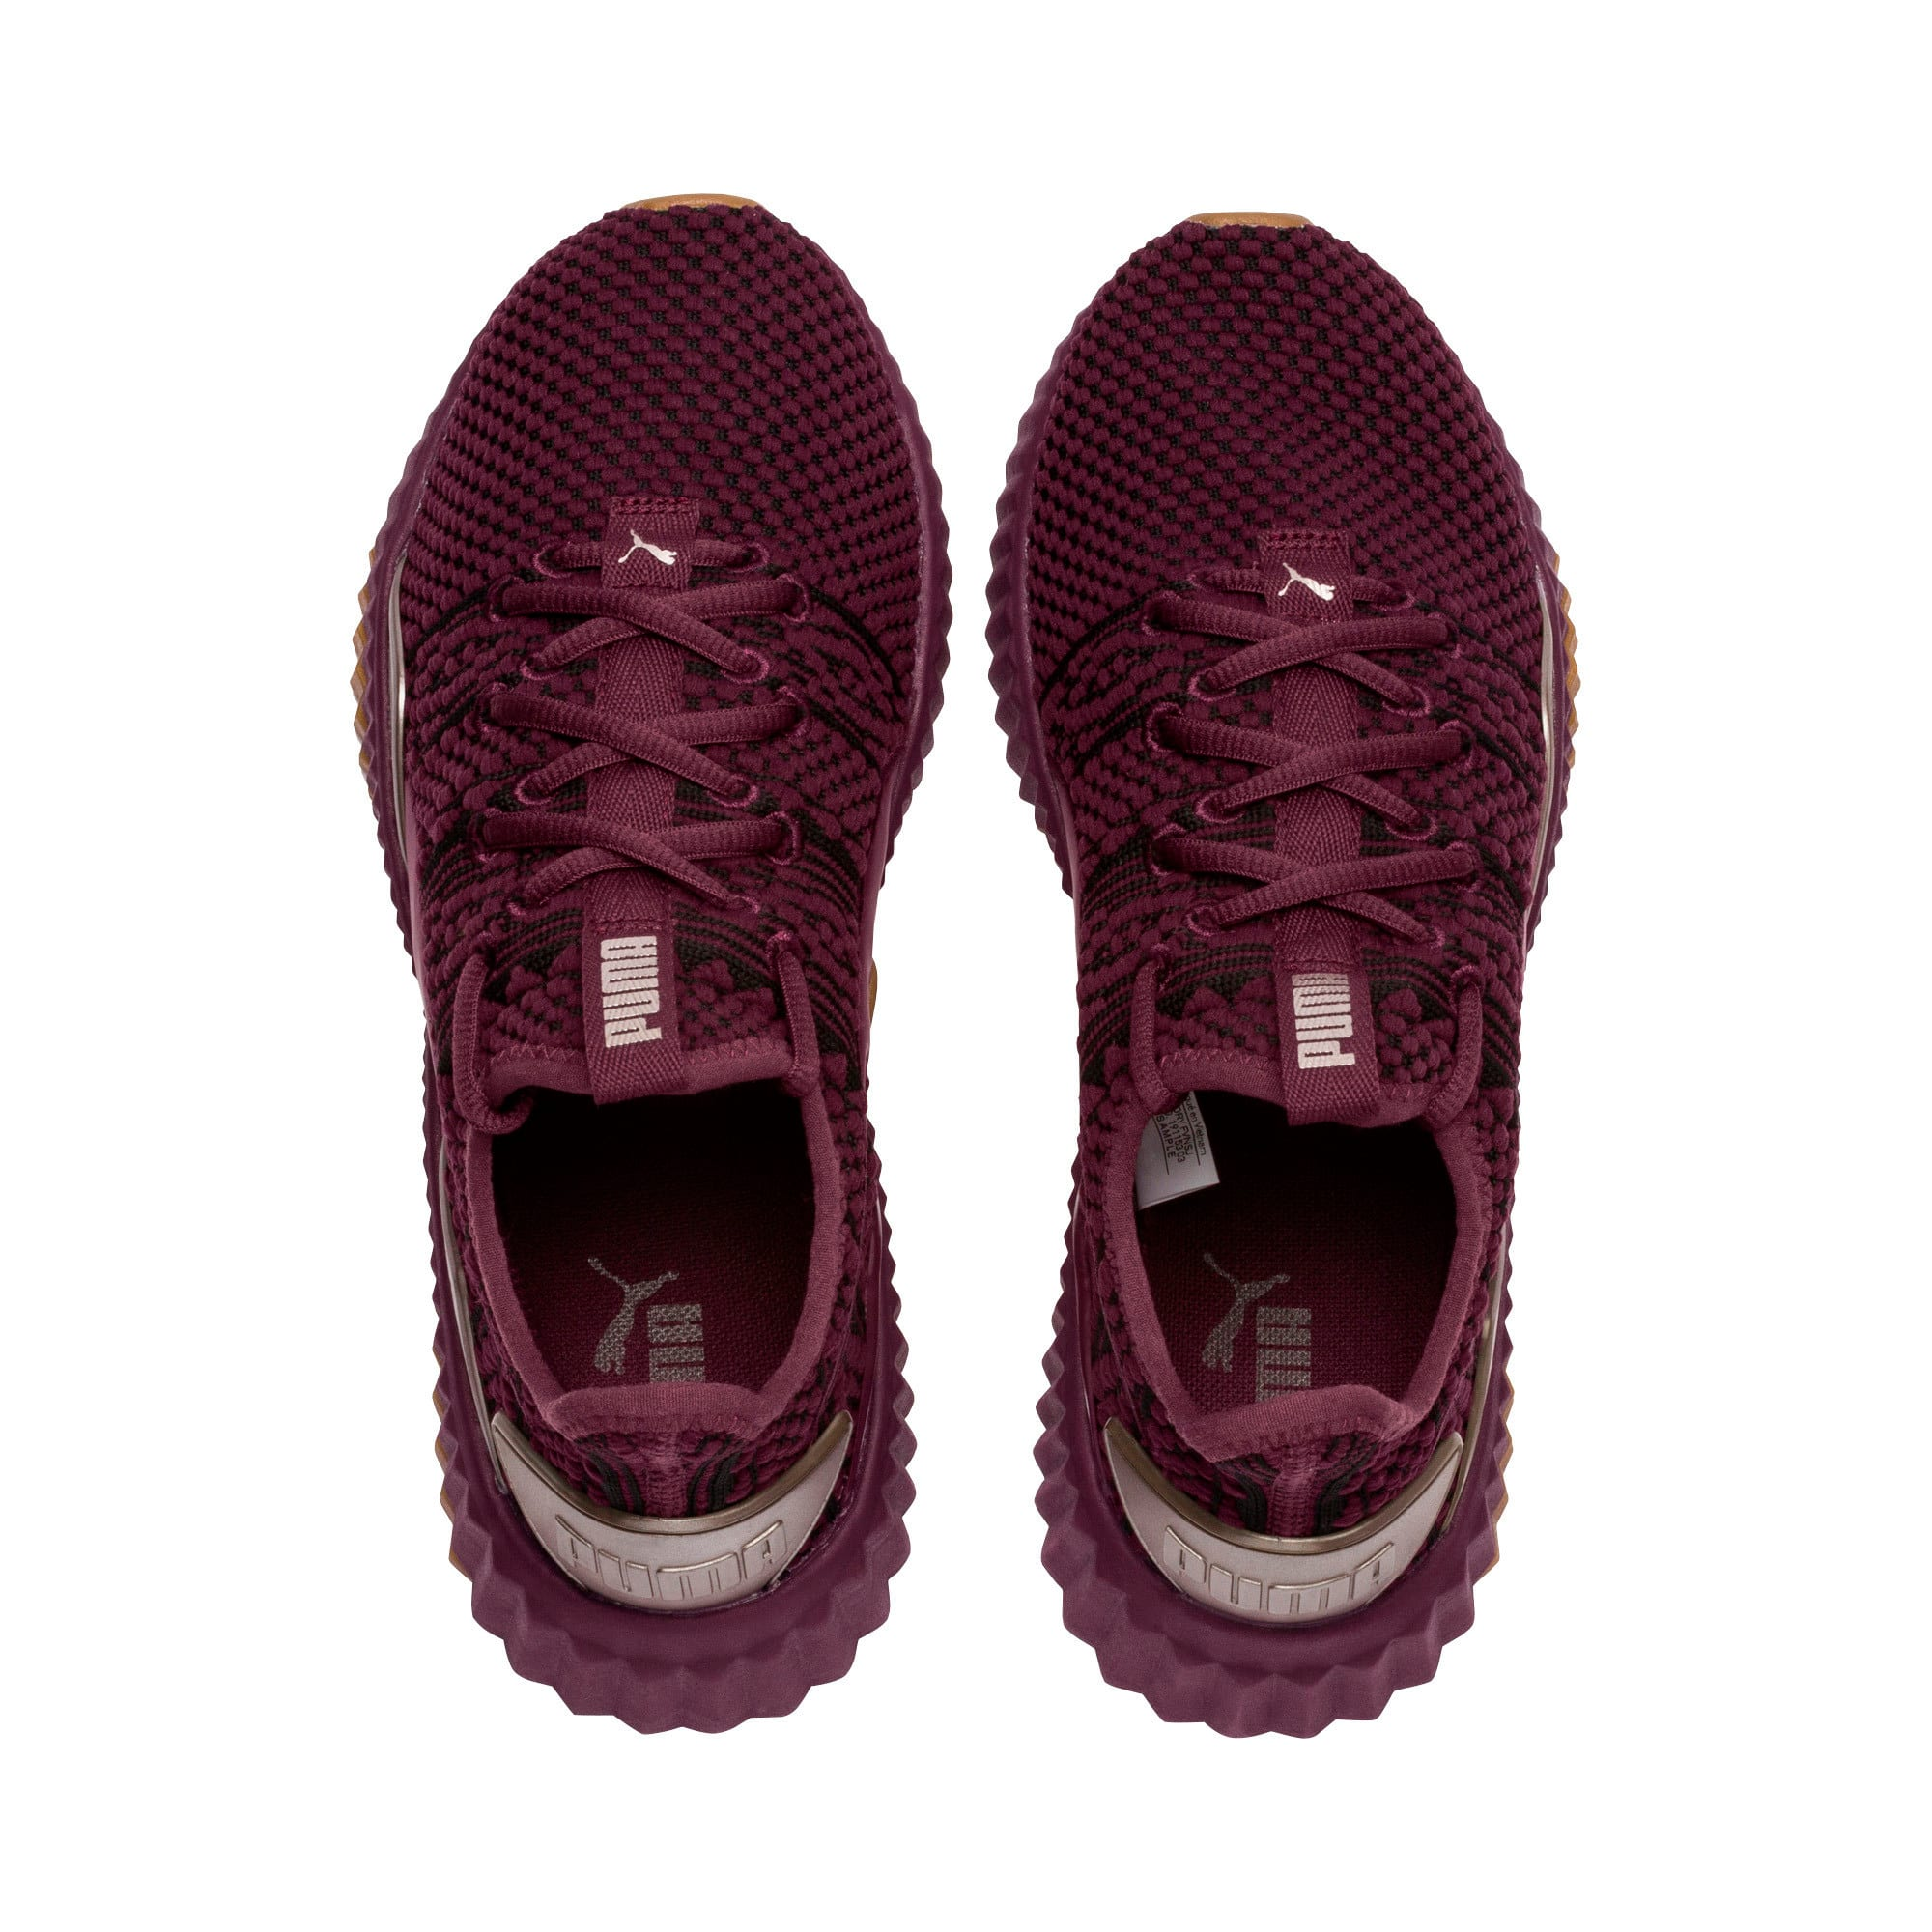 Thumbnail 6 of Defy Luxe Women's Training Shoes, Fig-Metallic Ash, medium